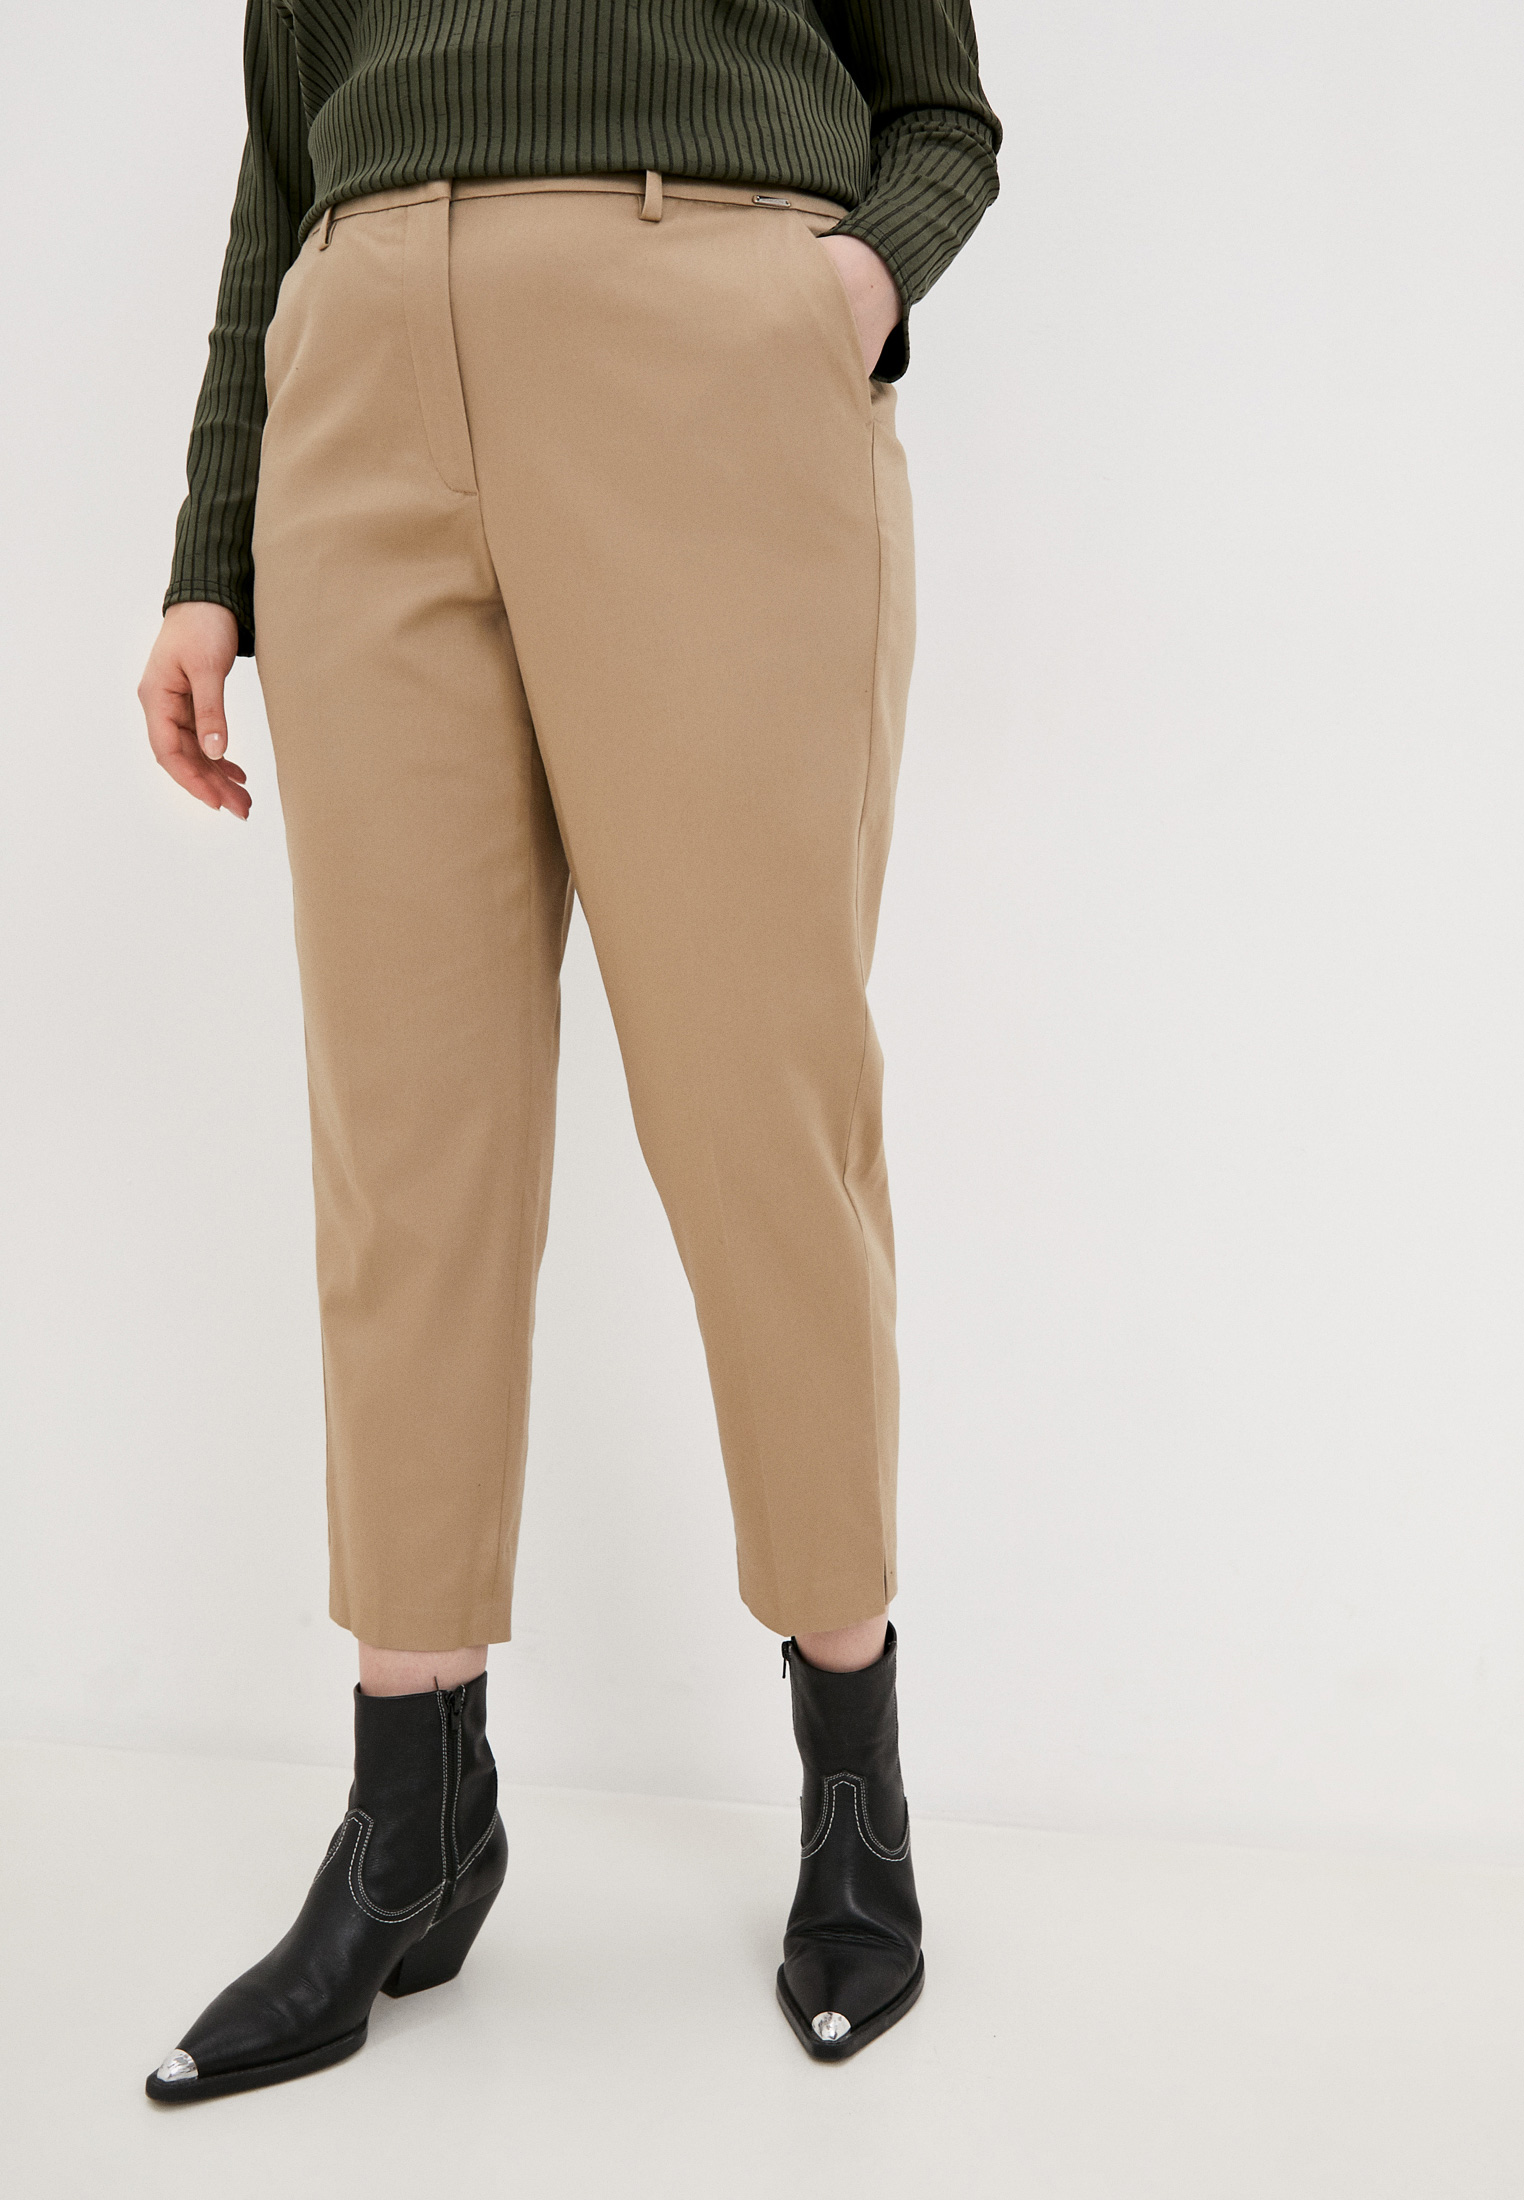 Женские прямые брюки Samoon by Gerry Weber 420010-21047